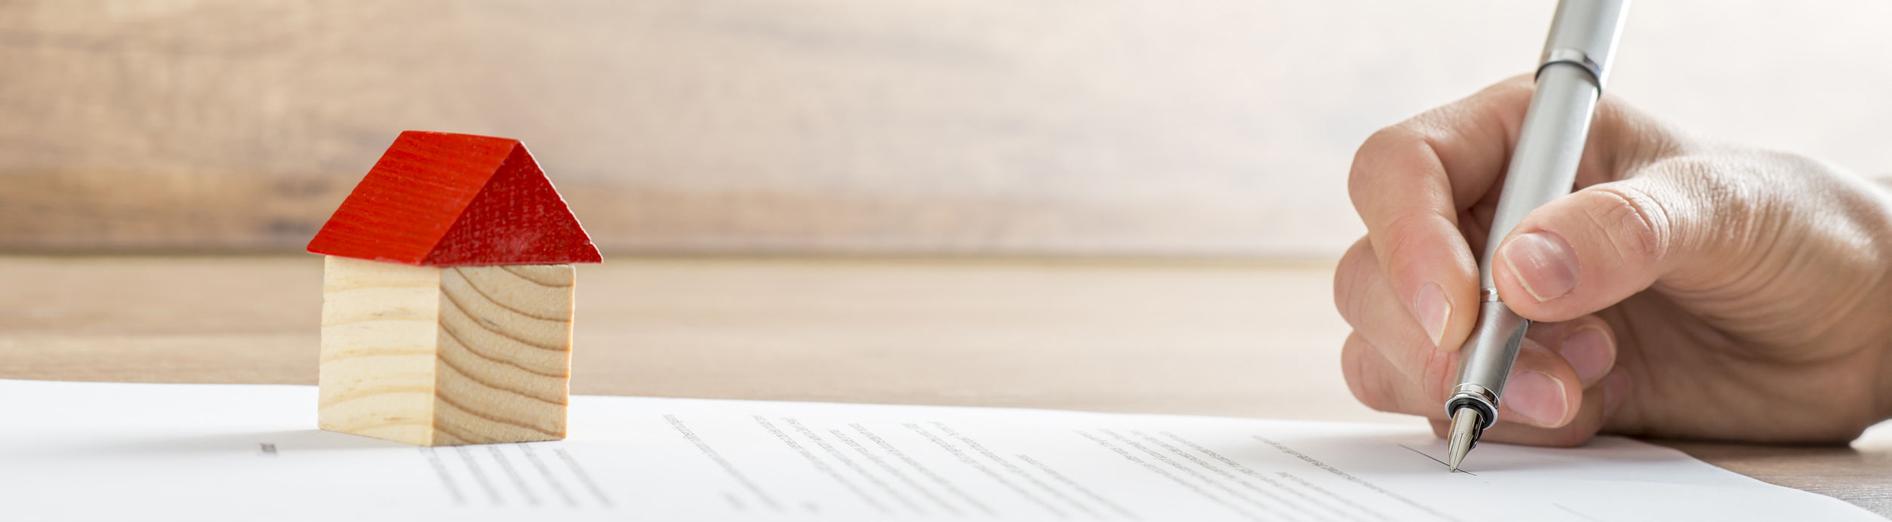 Mengapa Proses Akad Kredit KPR Penting?